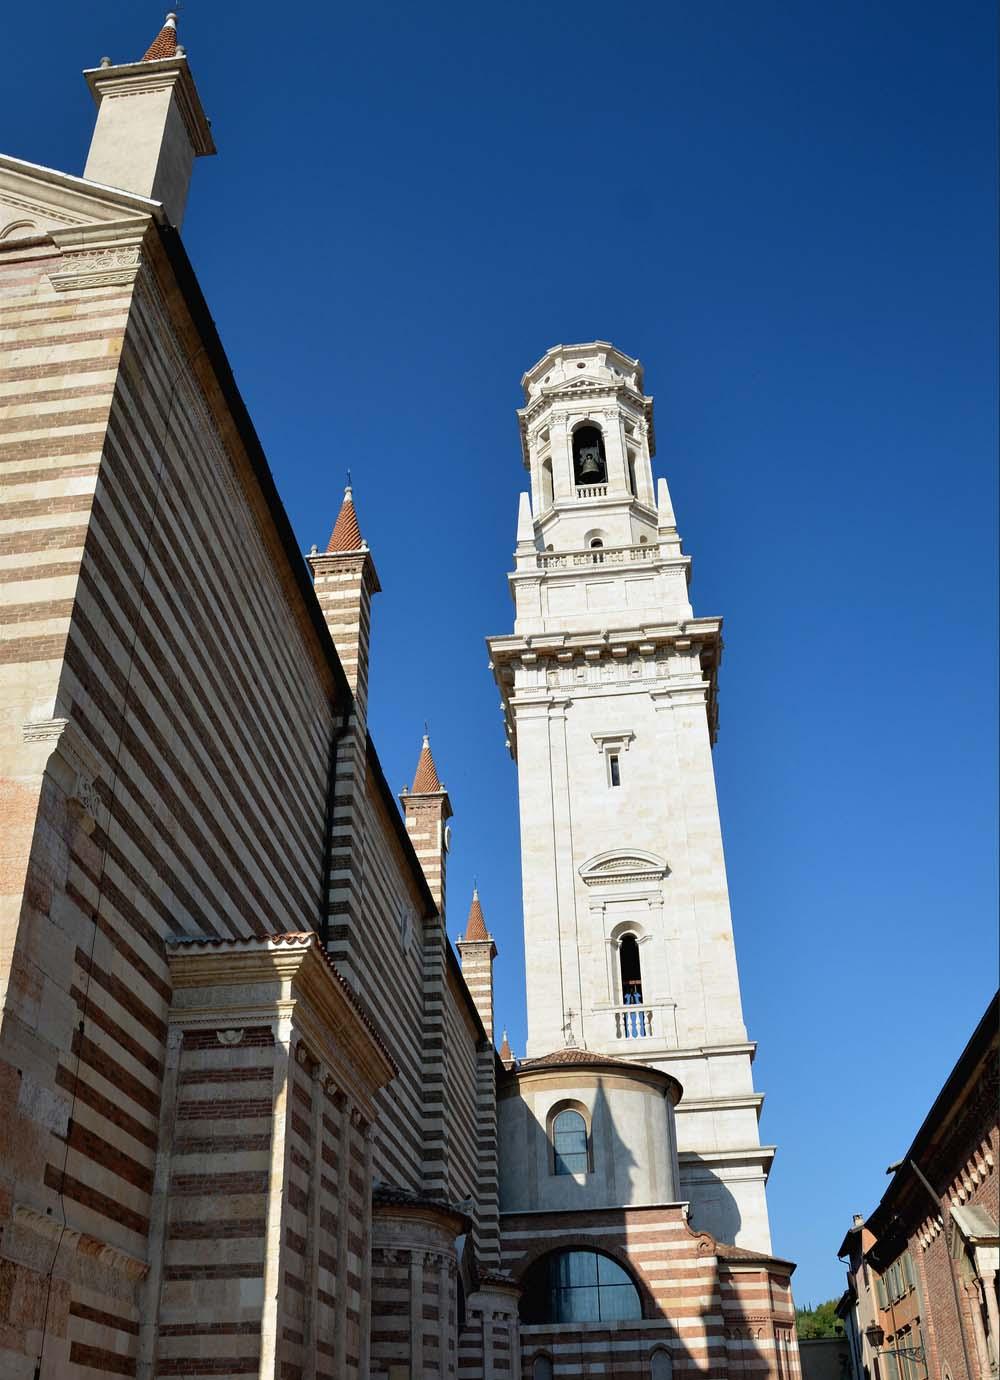 Tours - Verona and the architect Sanmicheli (photo 7)